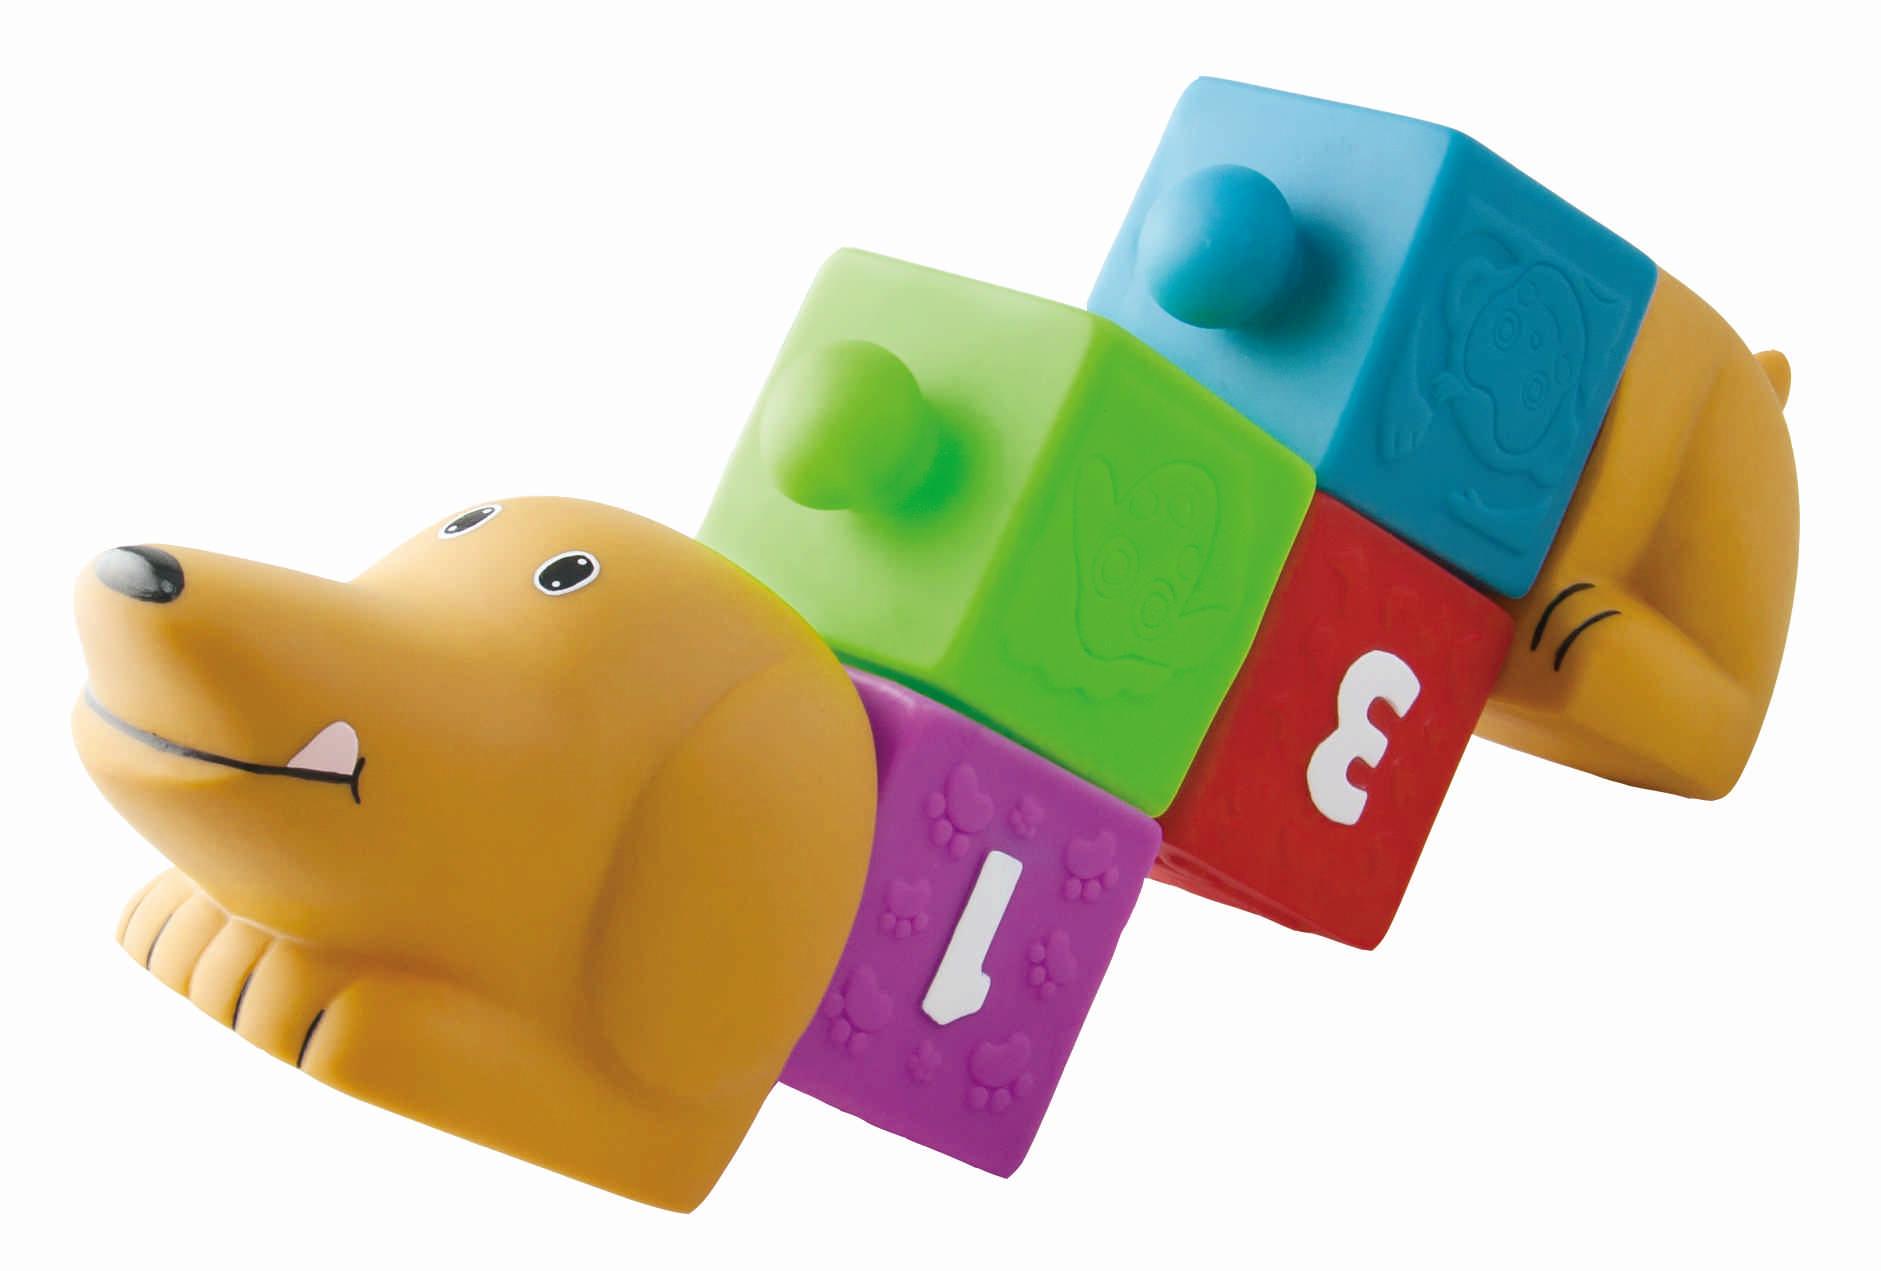 Развивающие игрушки Little Hero Собачка с кубиками мягкие игрушки maxitoys собачка зиночка в платье